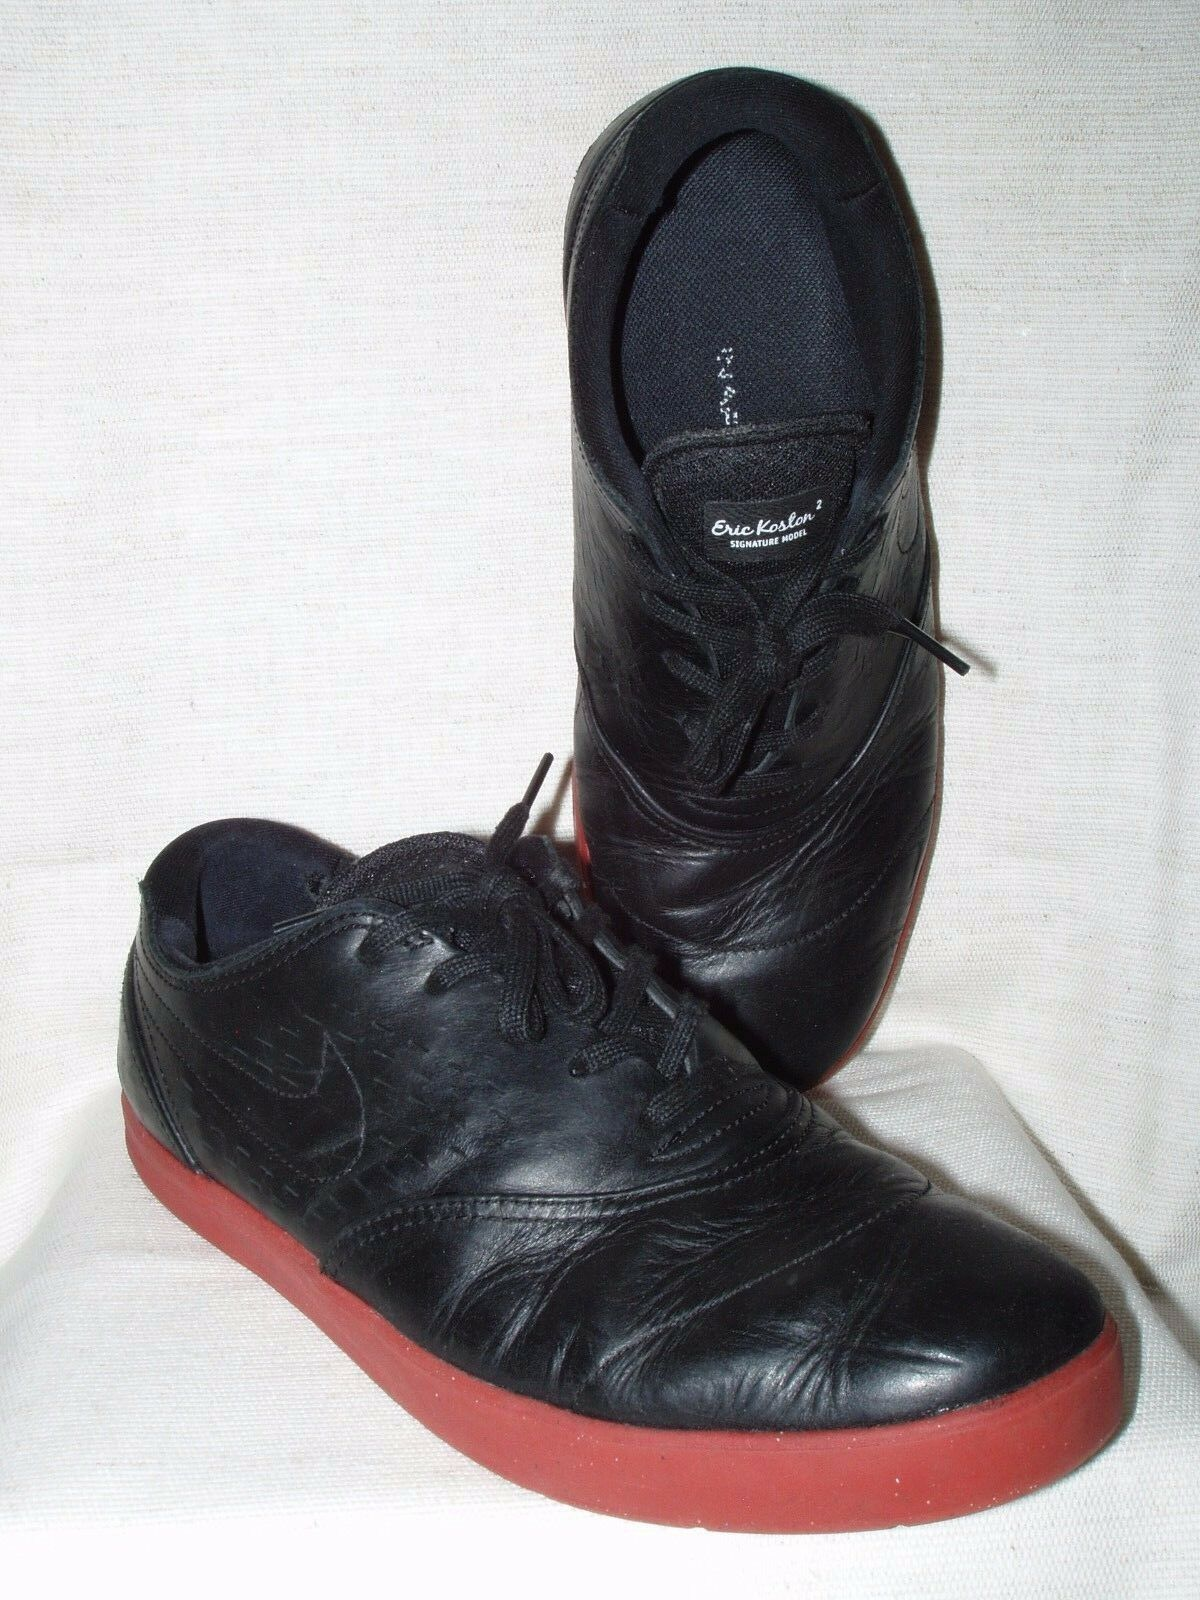 Mens shoes Nike Eric Koston 2 Sz 10 Black Leather  Excellent